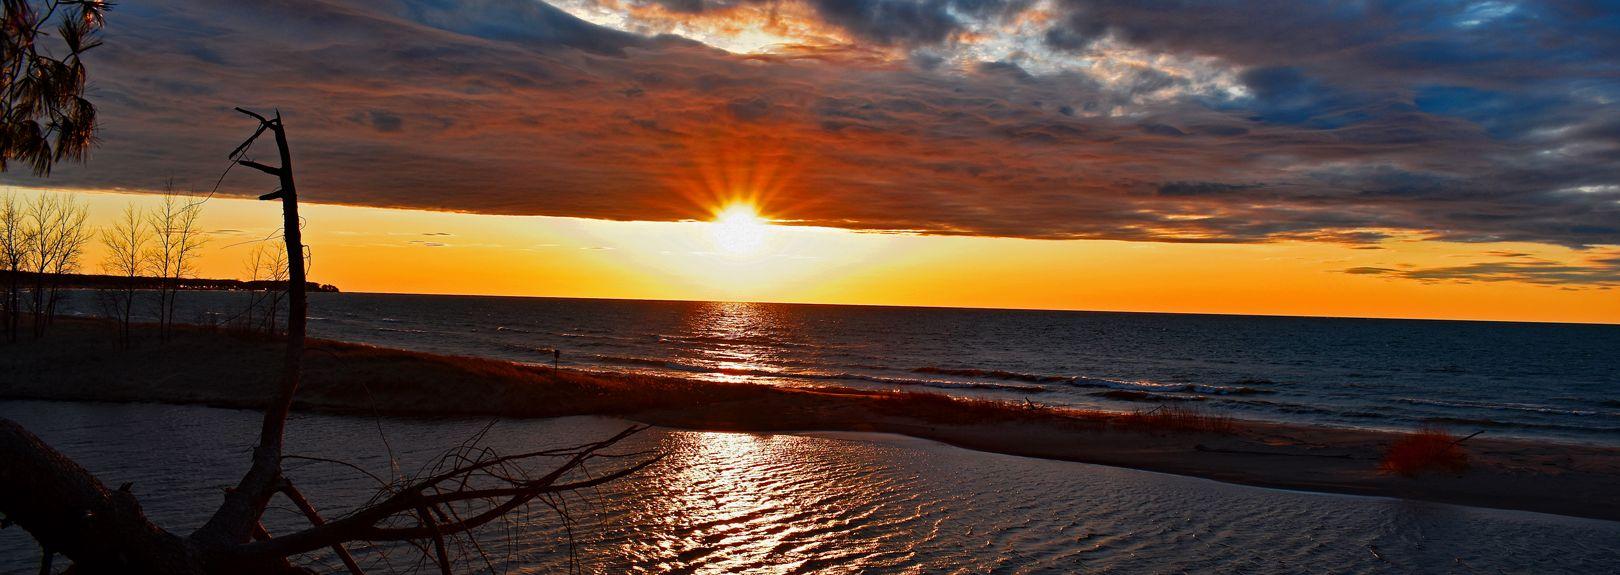 Lake Township, MI, USA